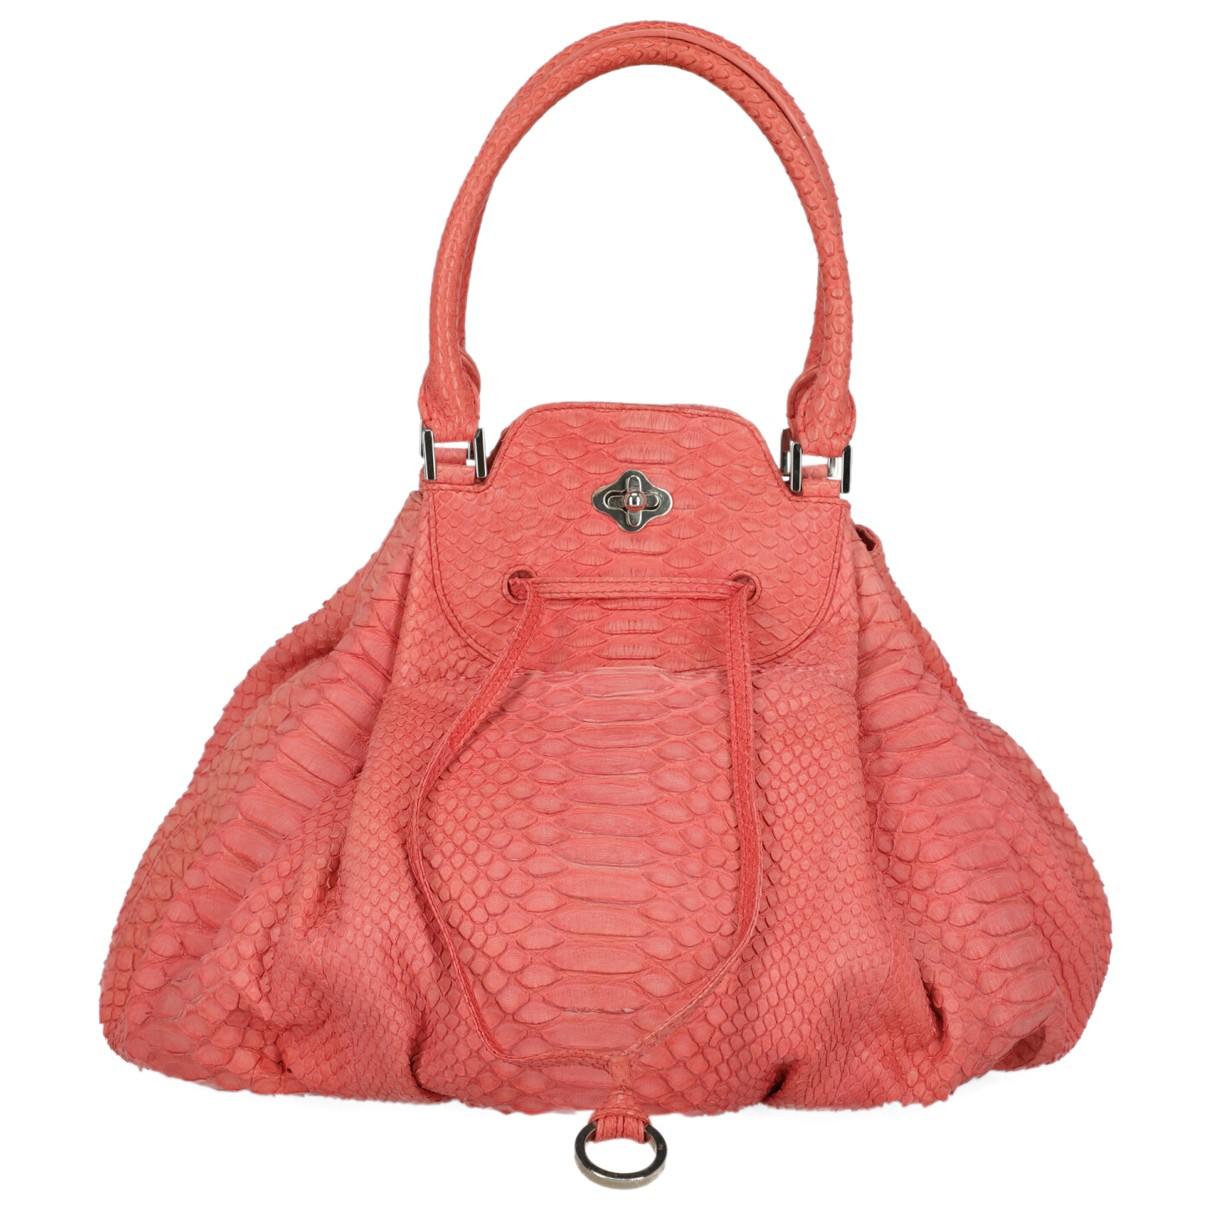 Emilio Pucci N Pink Python handbag for Women N